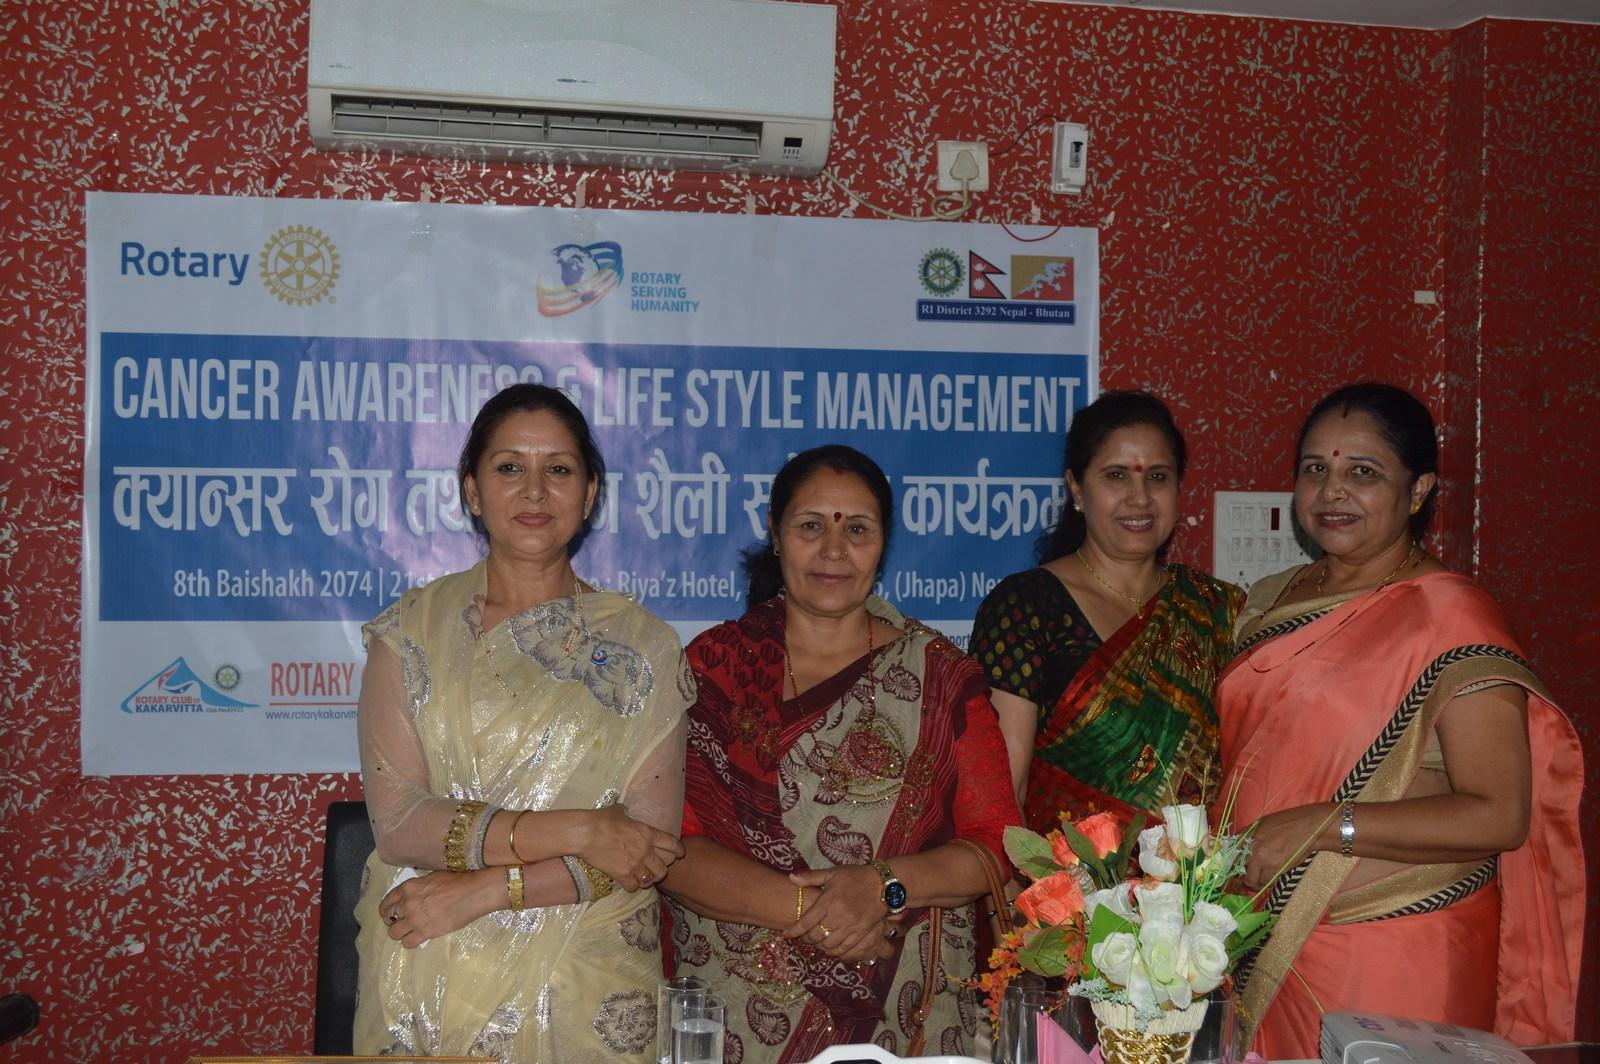 Cancer-Awareness-Life-Style-Management-Interaction-Program-2016-17-Rotary-Club-of-Kakarvitta-112